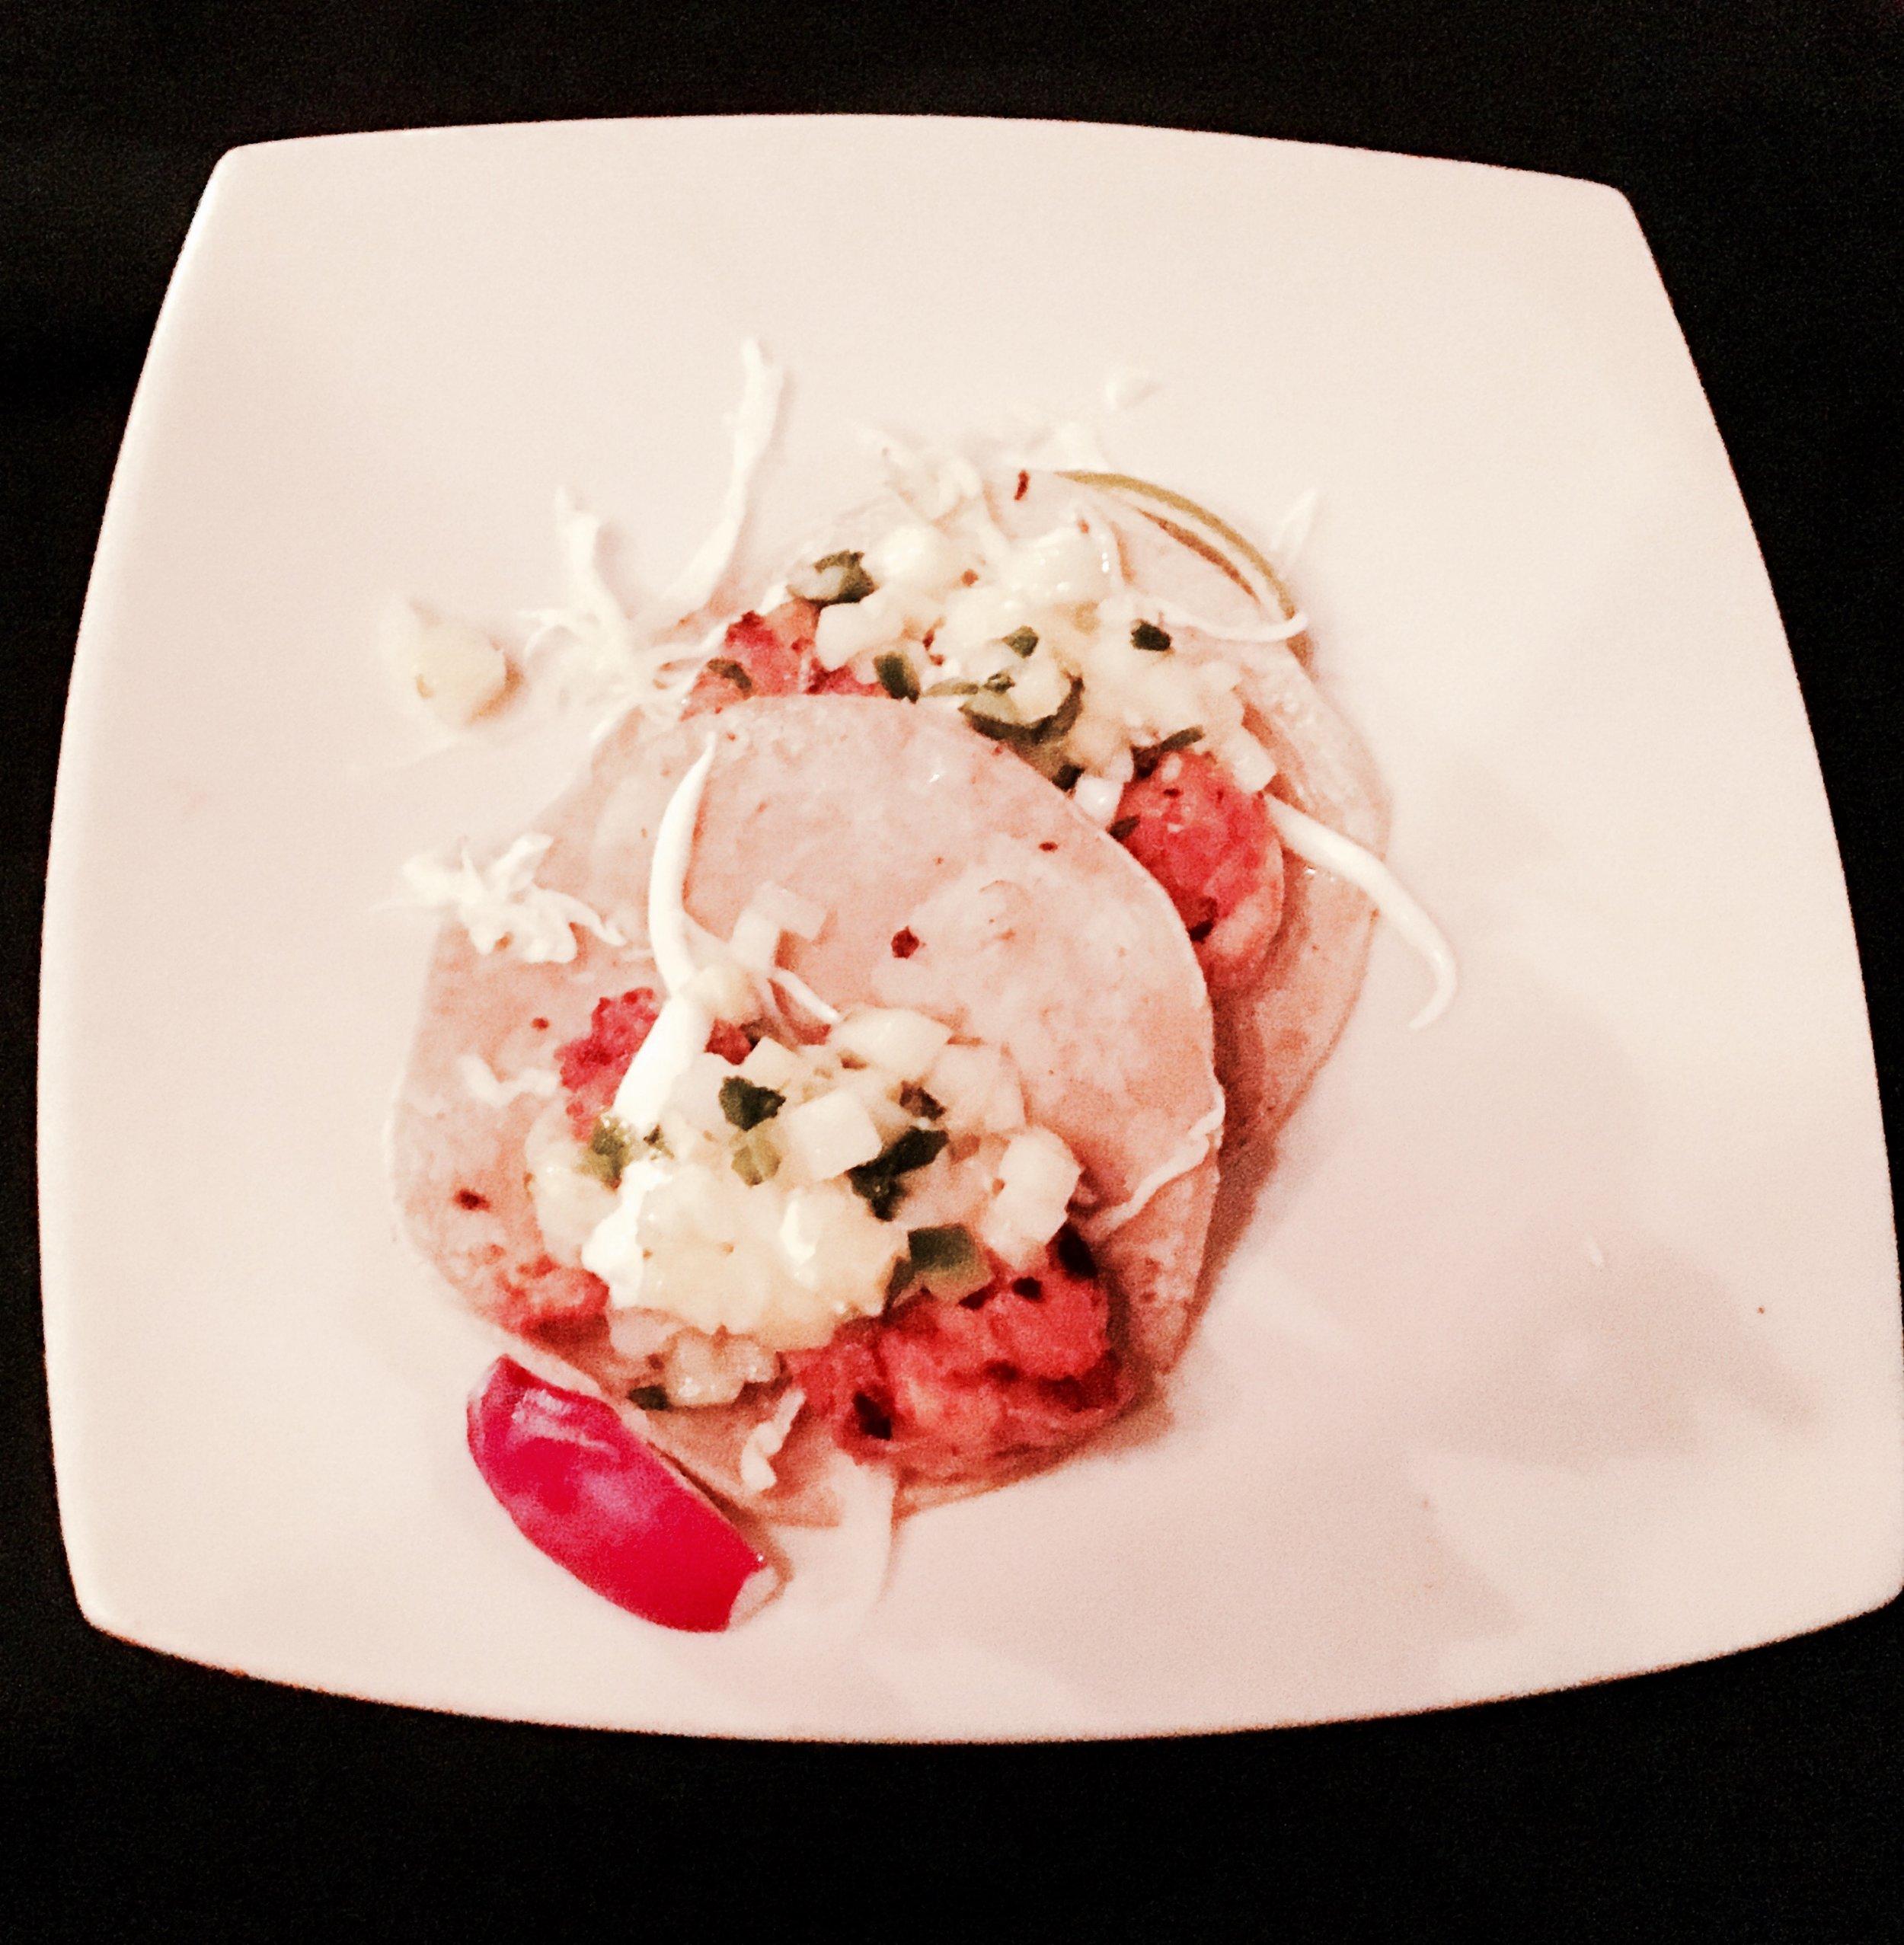 Camarones - Guajillo & Grapefruit Marinated Seared Shrimp, Cabbage, Crema, Watermelon Cucumber Salsa